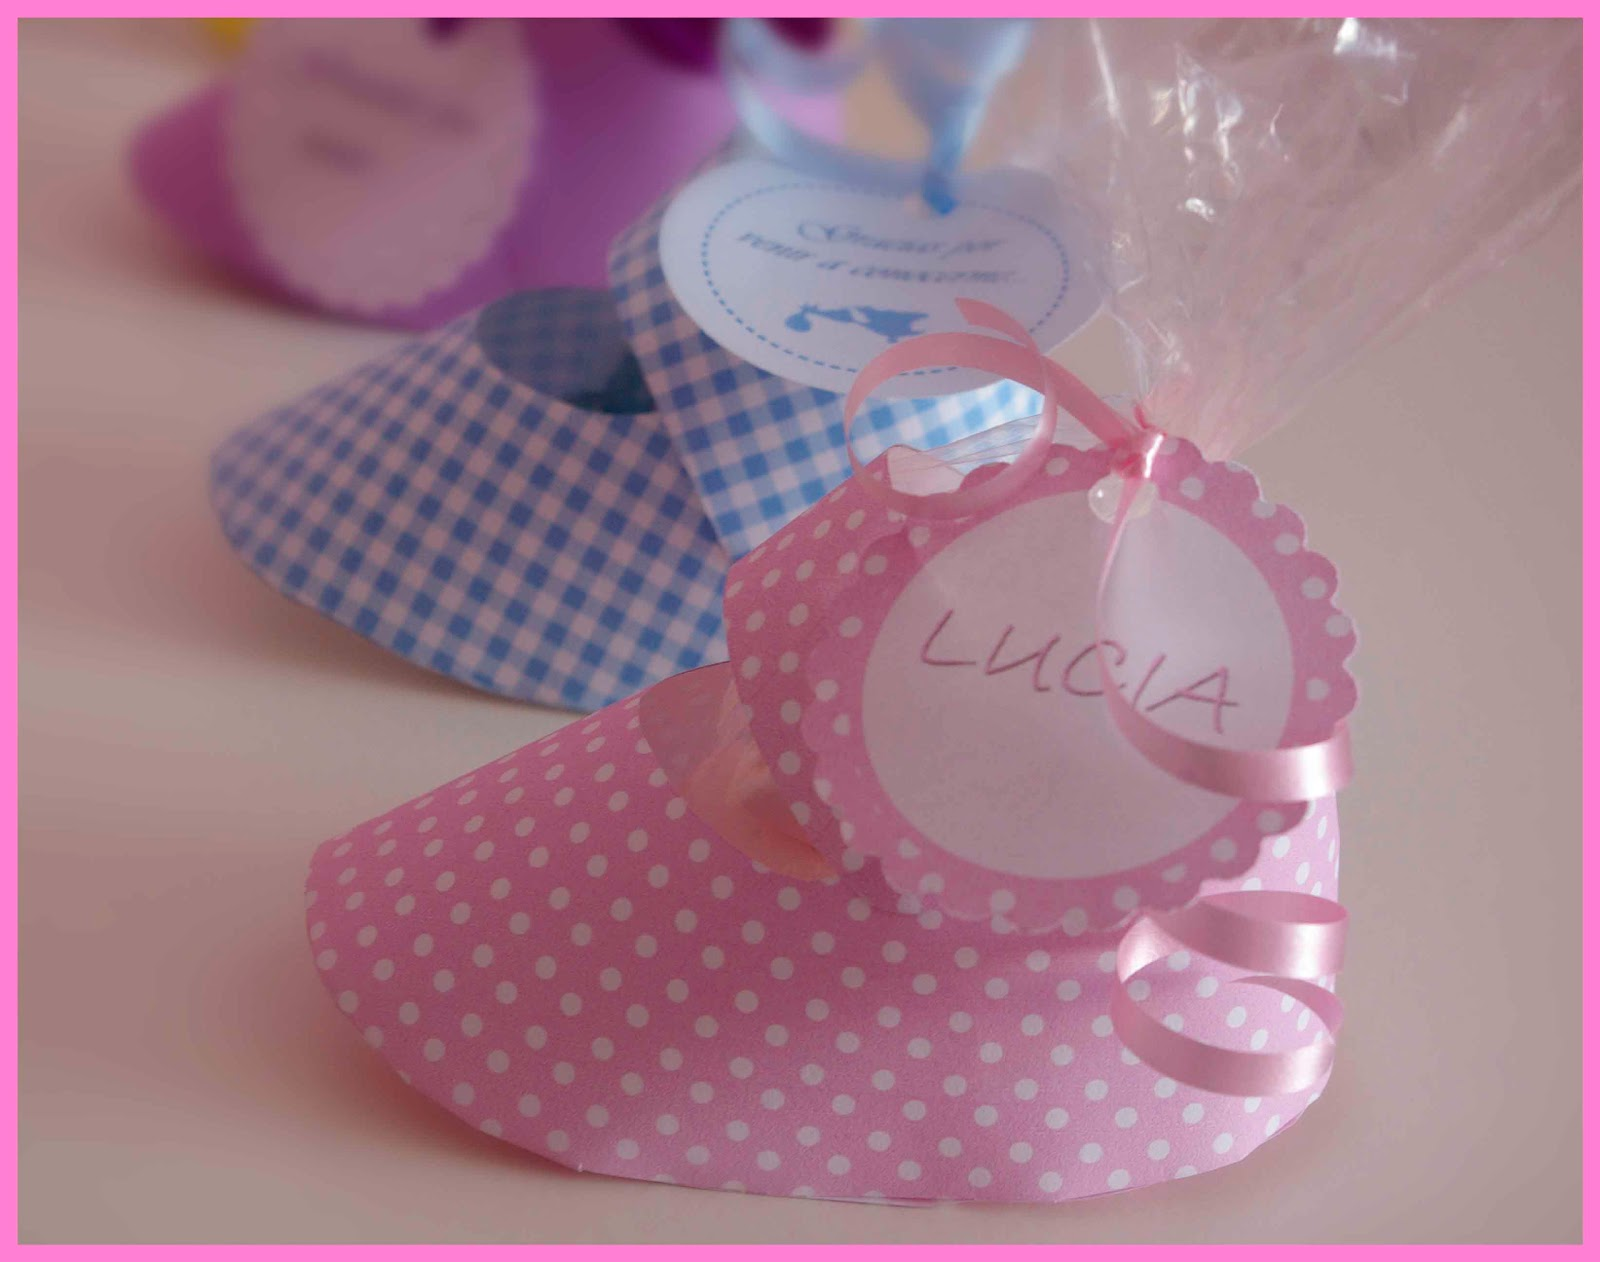 ... Idea para souvenir/decoración de Nacimientos, Baby Shower o Bautizos